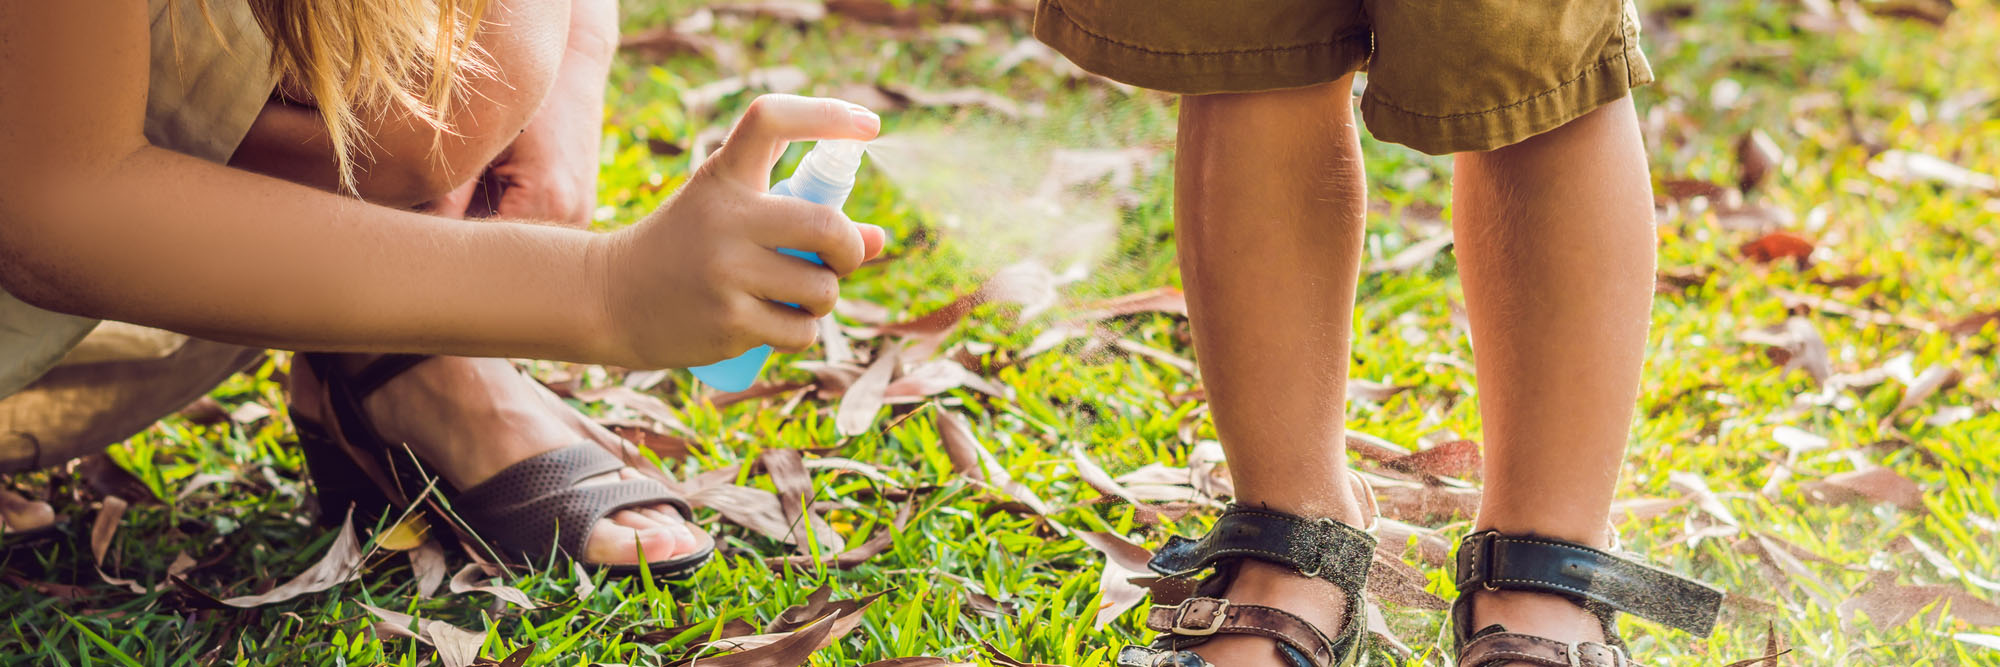 Hoe bescherm ik mezelf tegen muggen op reis?